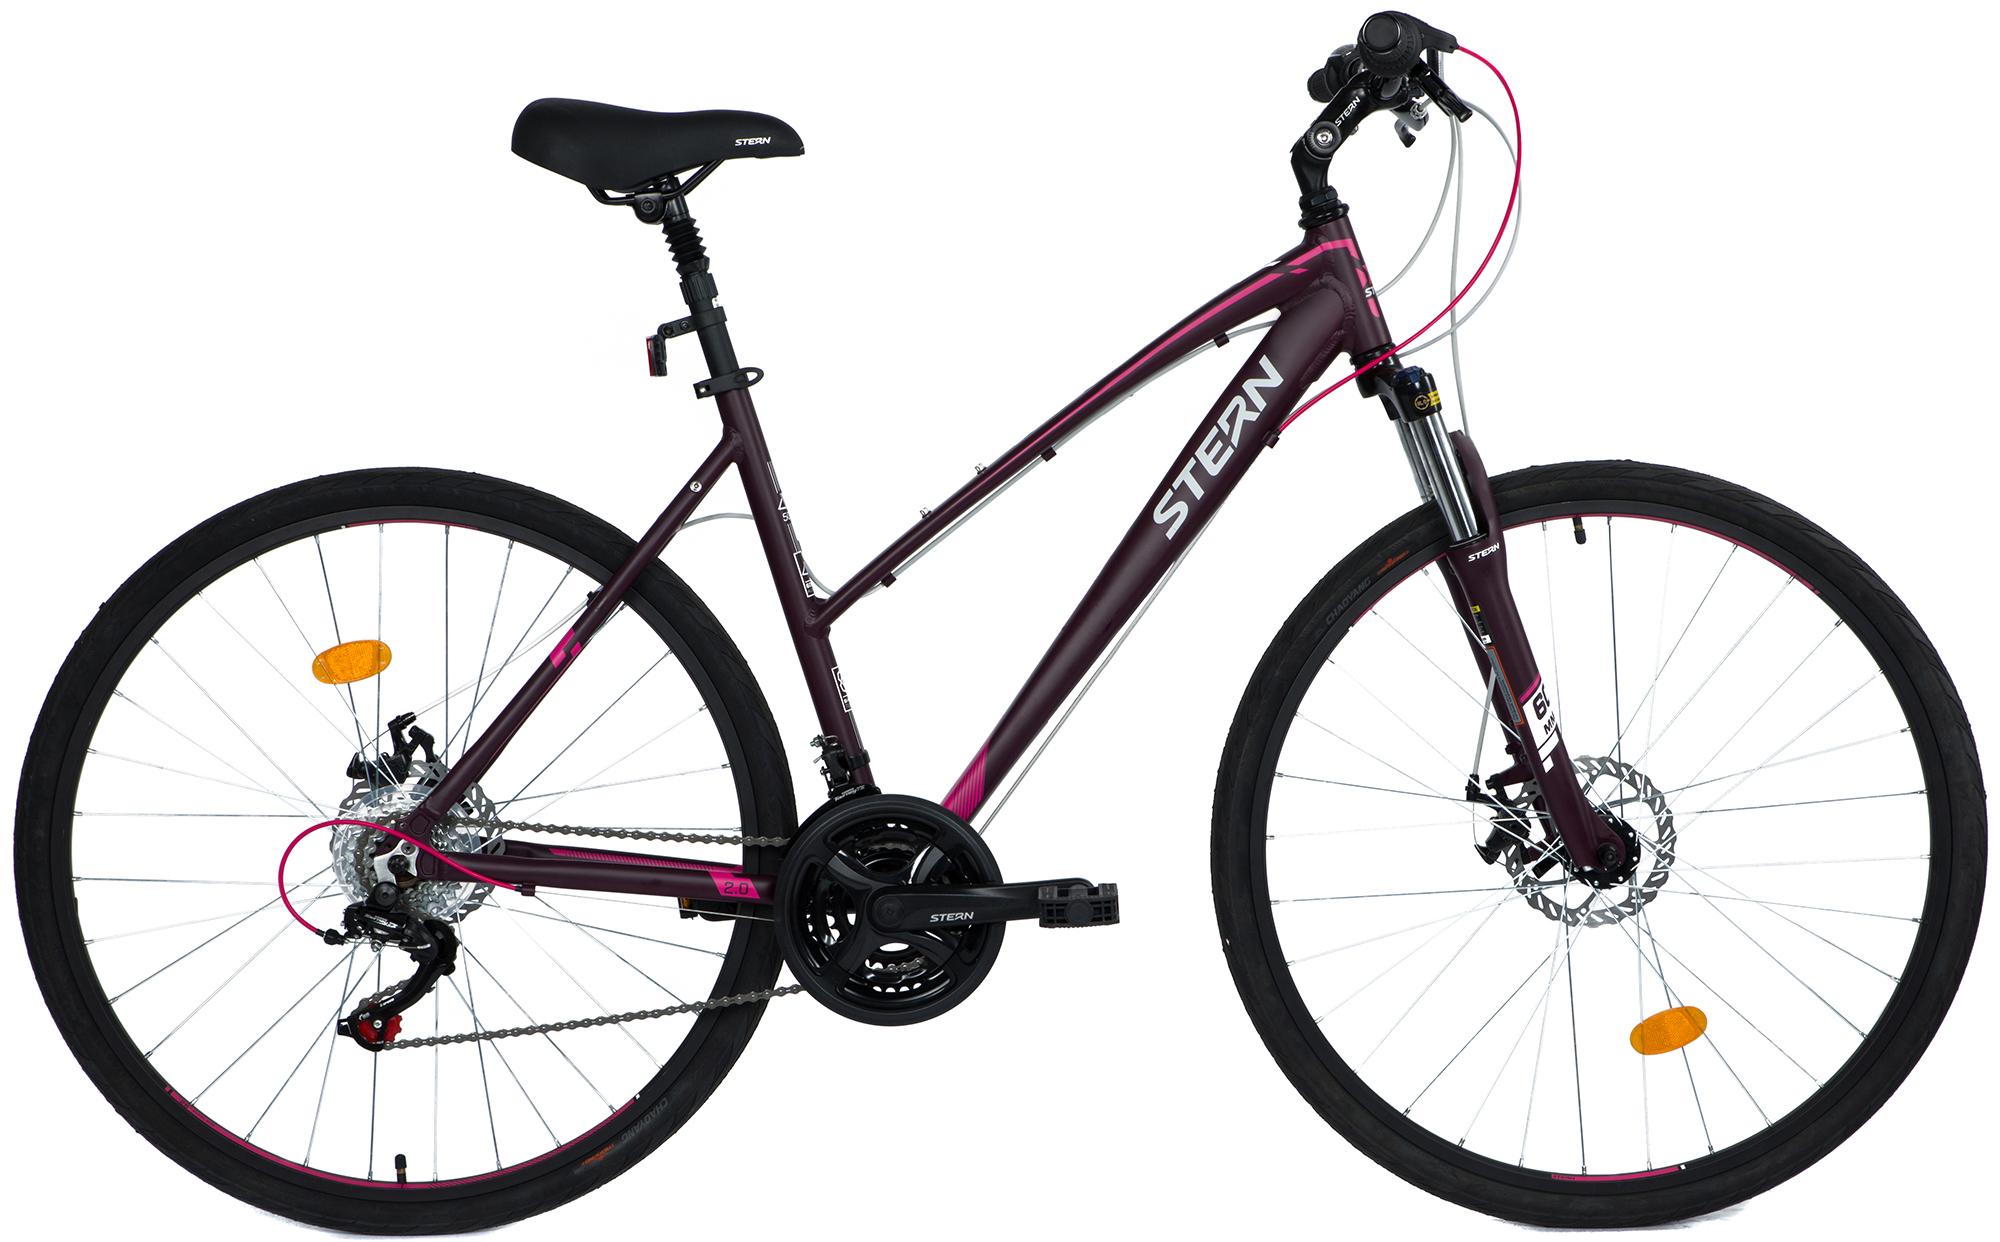 Stern Велосипед городской женский Stern Urban 2.0 Lady 28 велосипед ghost square urban 2 2016